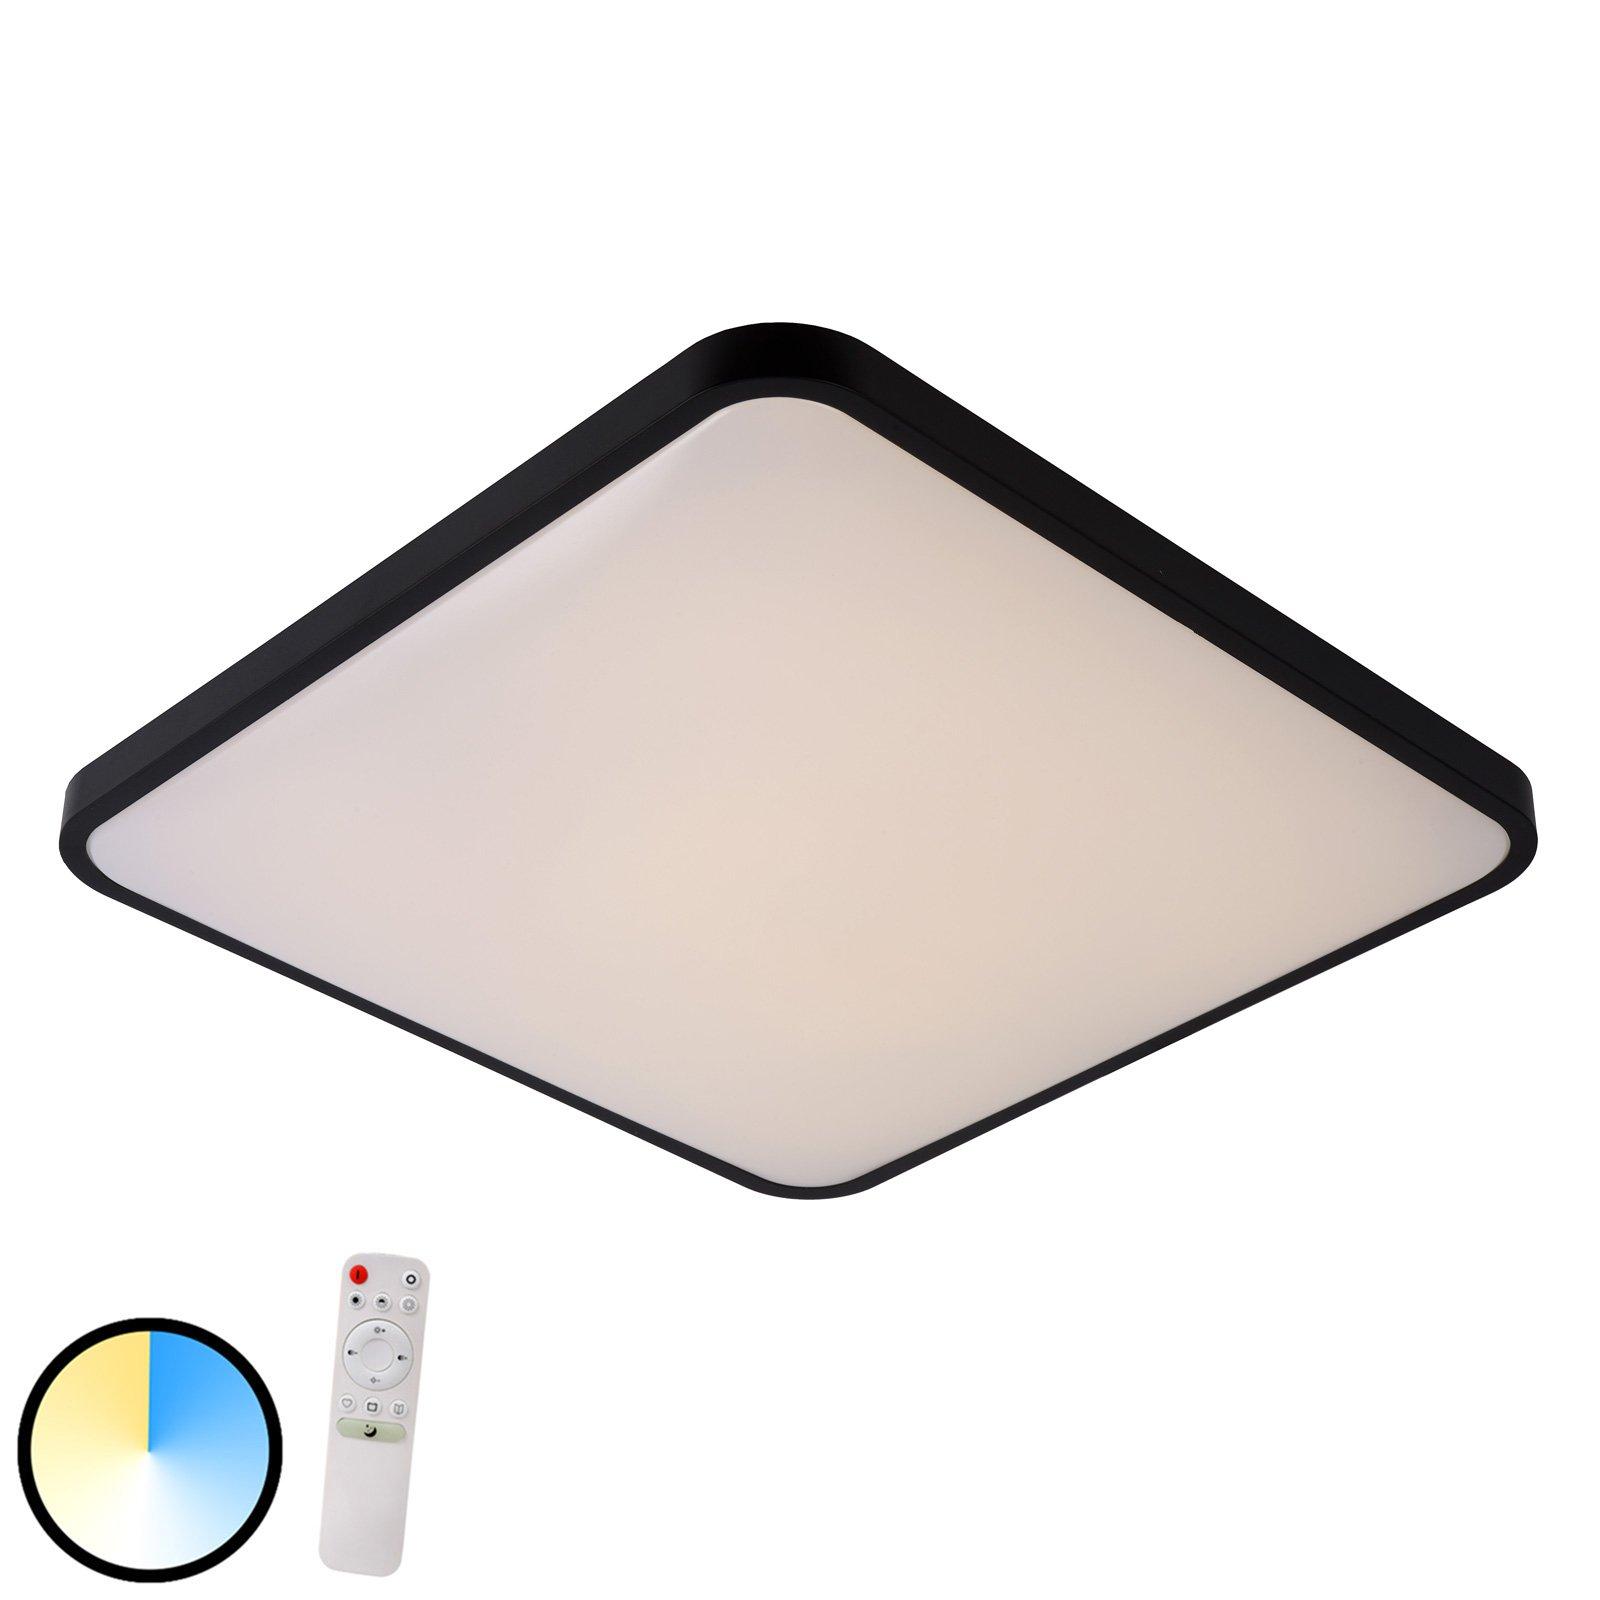 Polaris LED-taklampe 54 x 54 cm